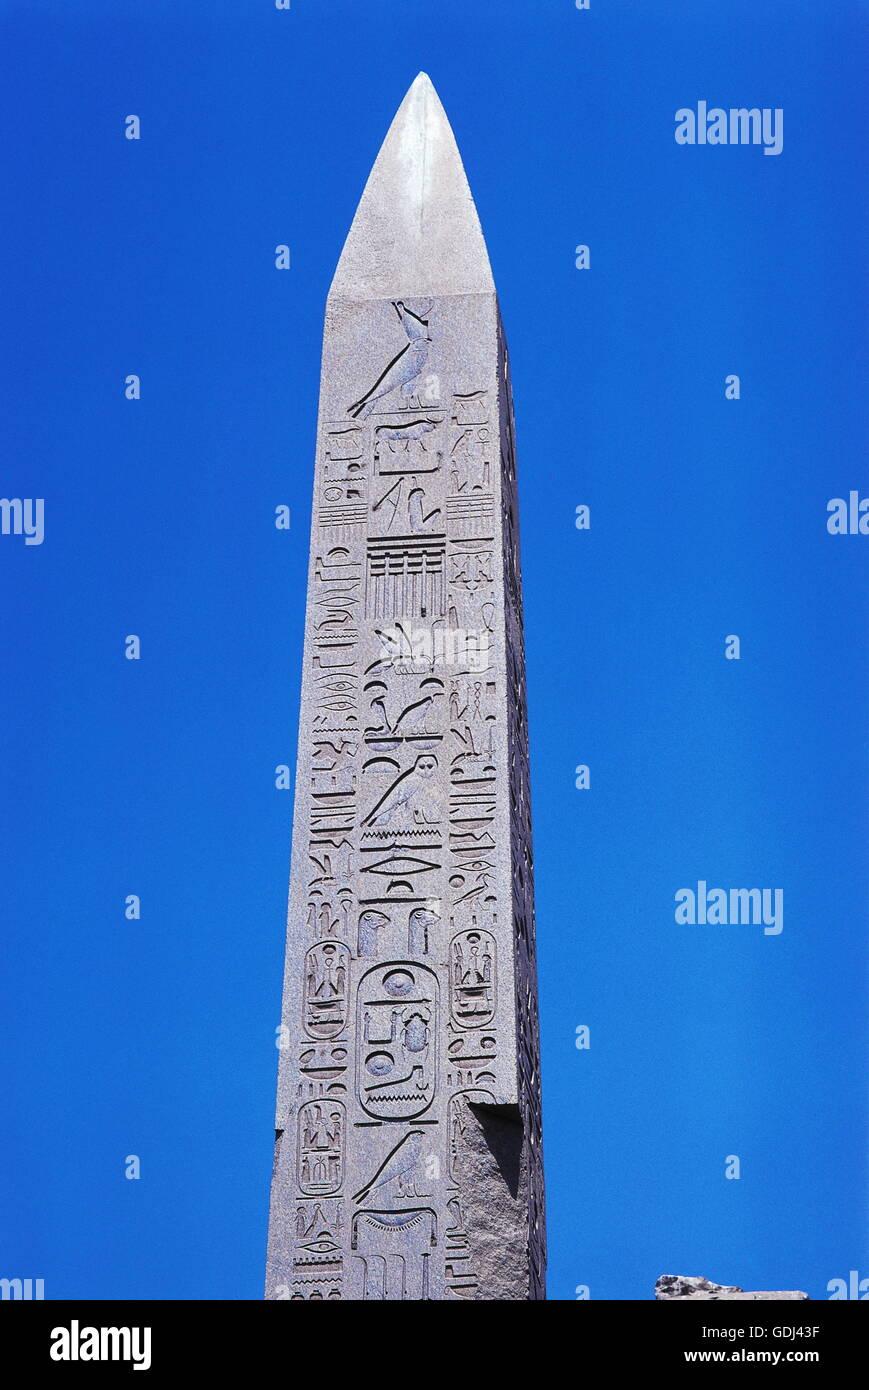 geography / travel, Egypt, Karnak, Amun Temple, obelisk of King Thutmose I (18th dynasty), detail, top, - Stock Image